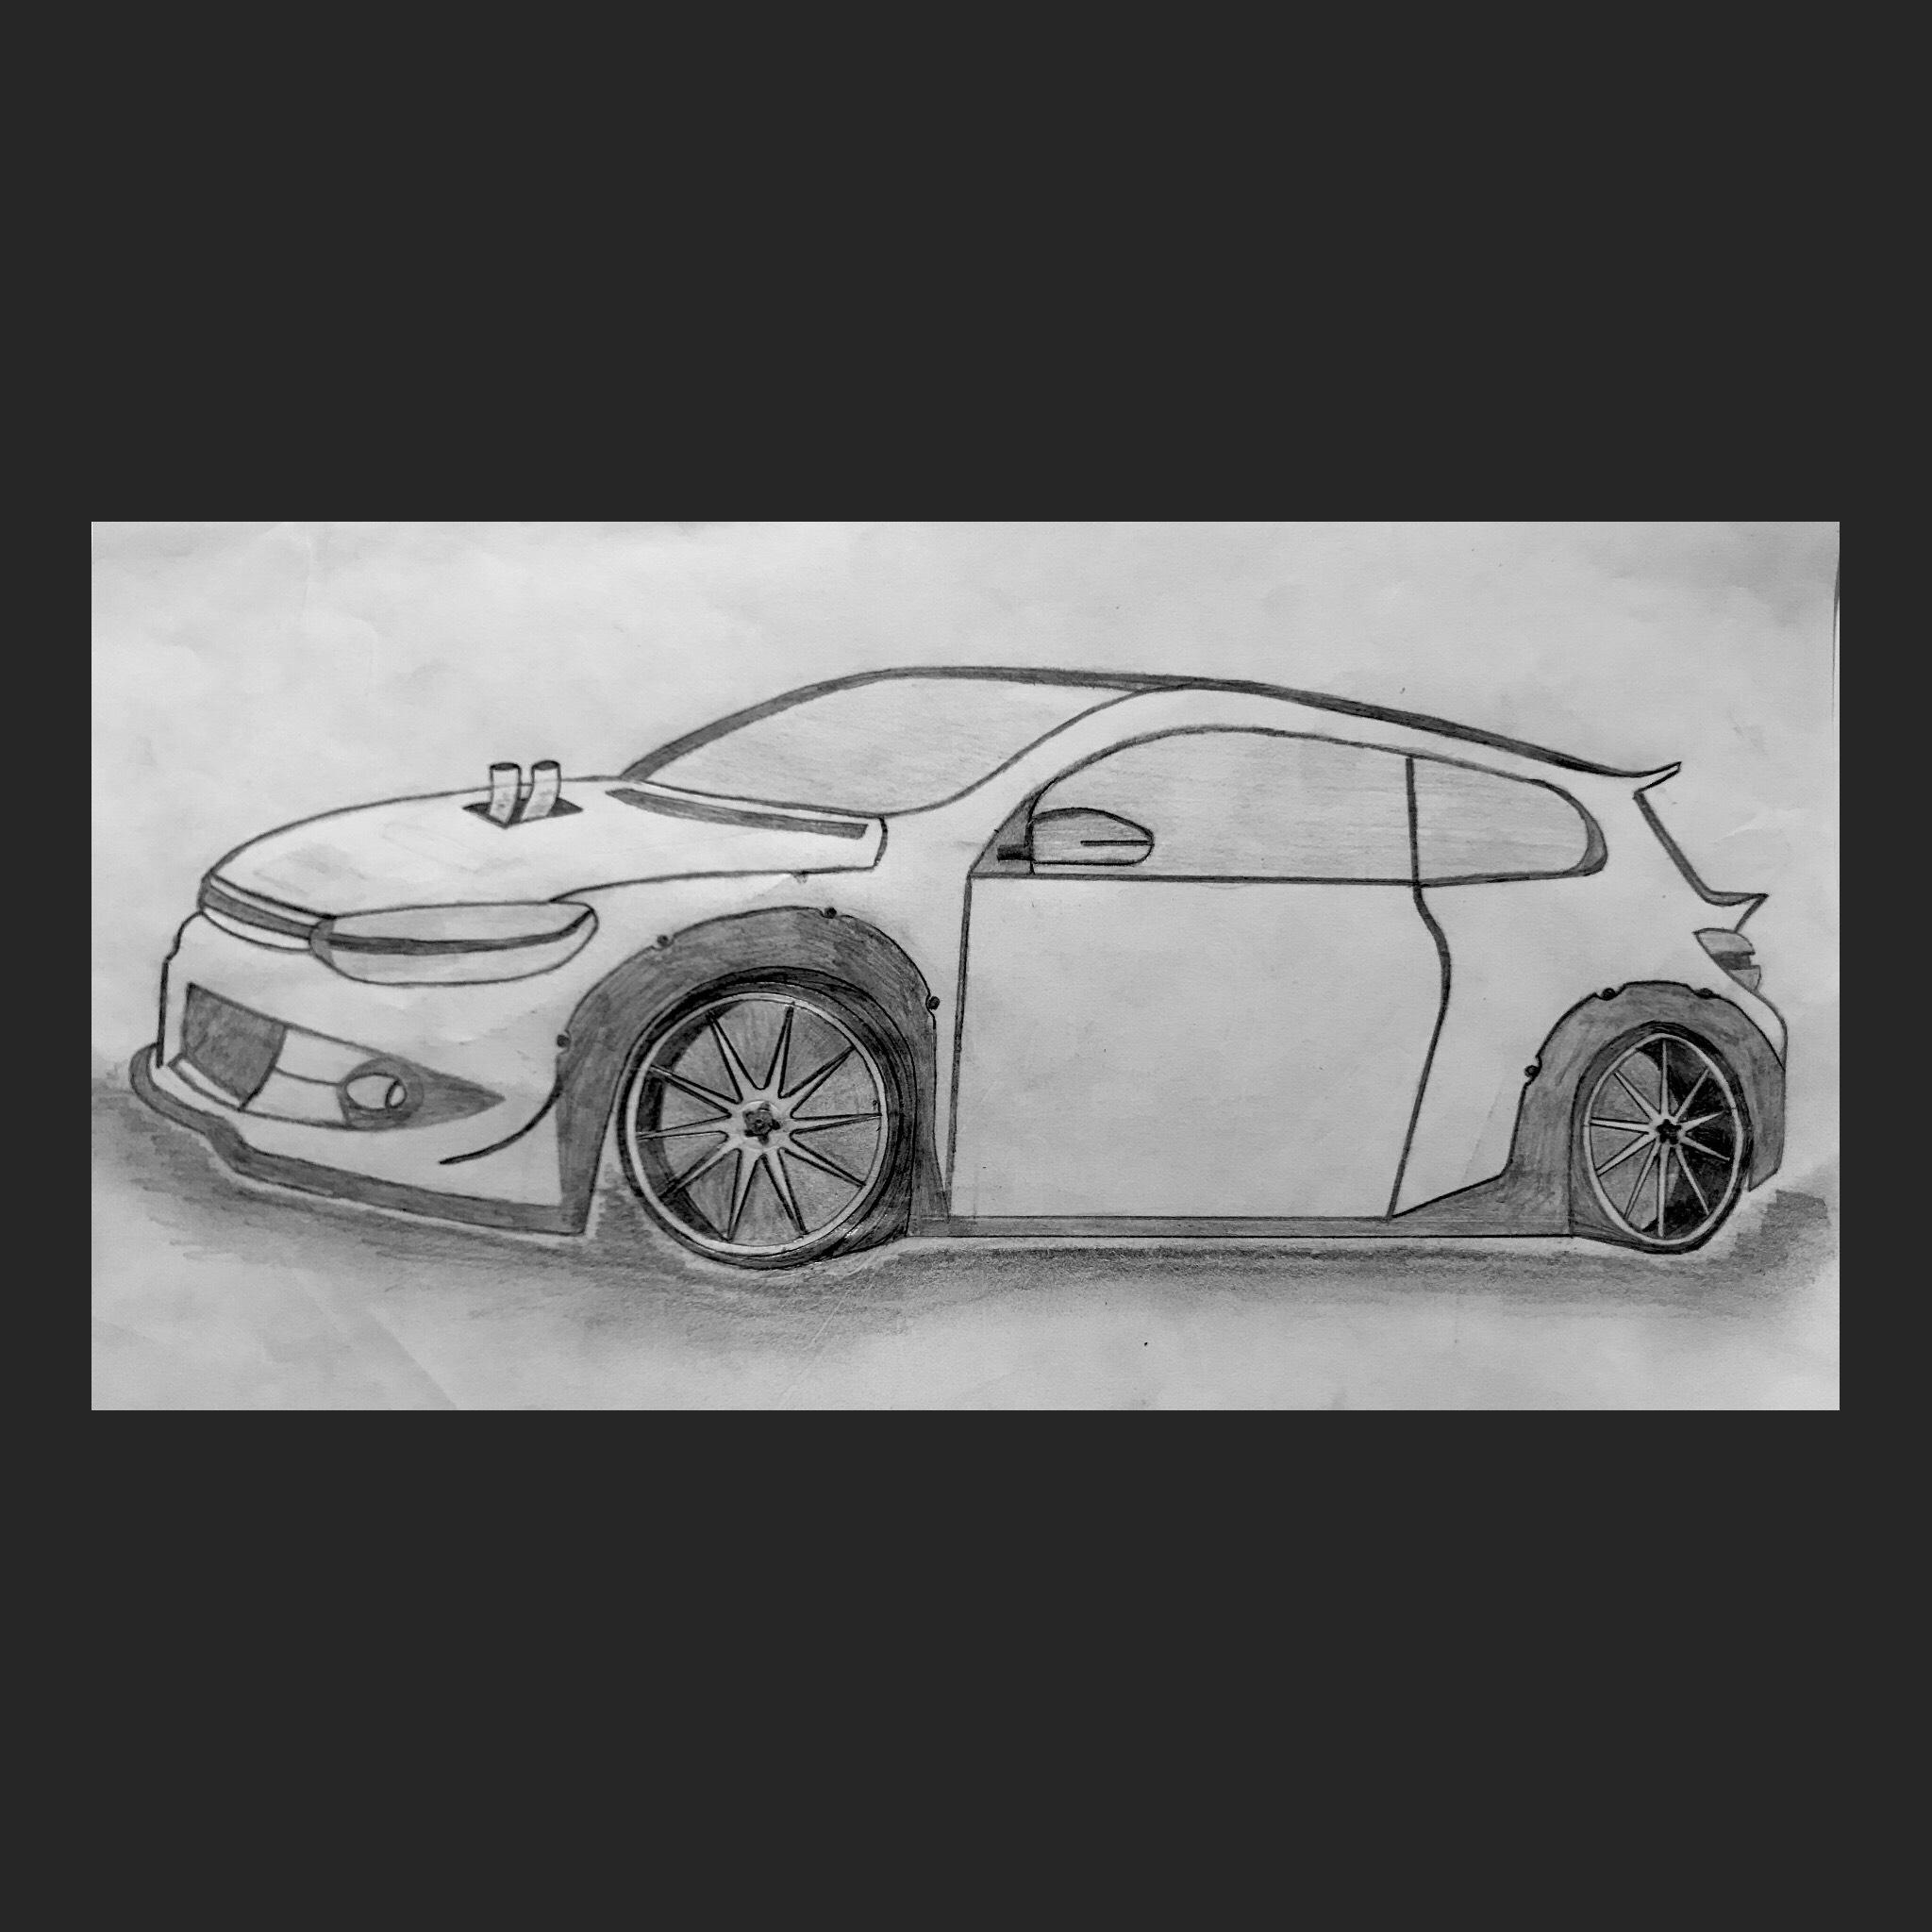 Custom Vw Scirocco R Drawing